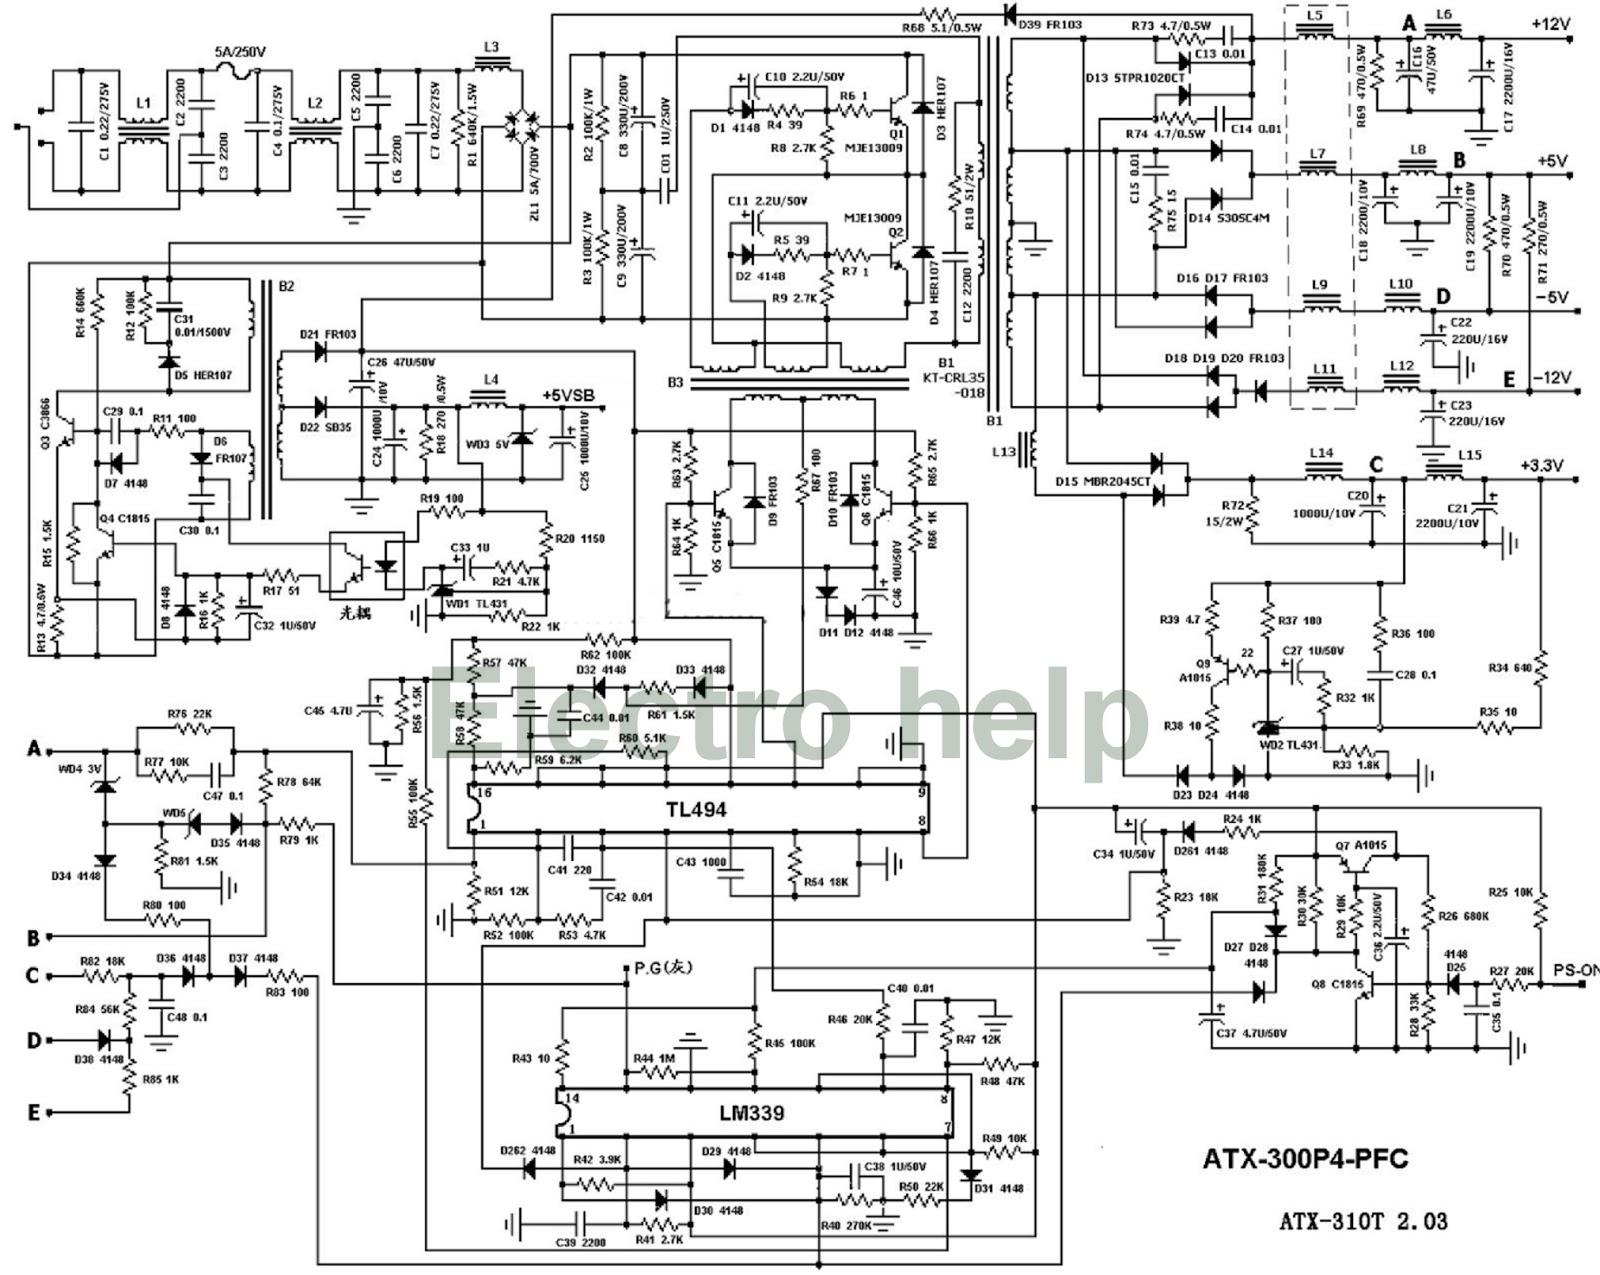 OC_6910] Atx Power Supply Circuit Also Atx Power Supply Schematic Diagram  Wiring DiagramBotse Antus Nect Rdona Scoba Mohammedshrine Librar Wiring 101